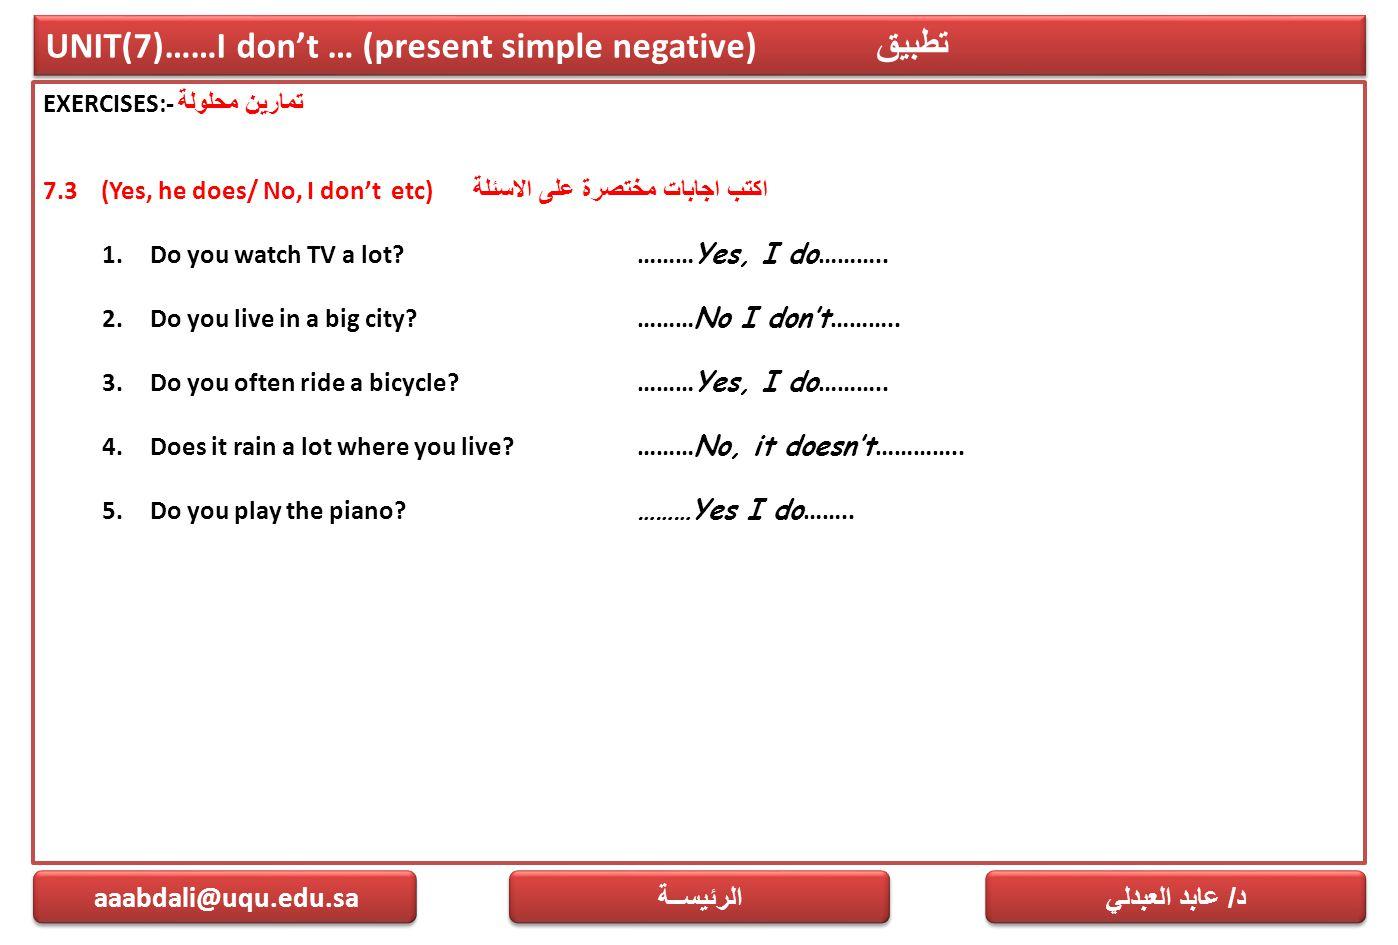 UNIT(7)……I don't … (present simple negative) تطبيق EXERCISES:- تمارين محلولة 7.3 (Yes, he does/ No, I don't etc) اكتب اجابات مختصرة على الاسئلة 1.Do y